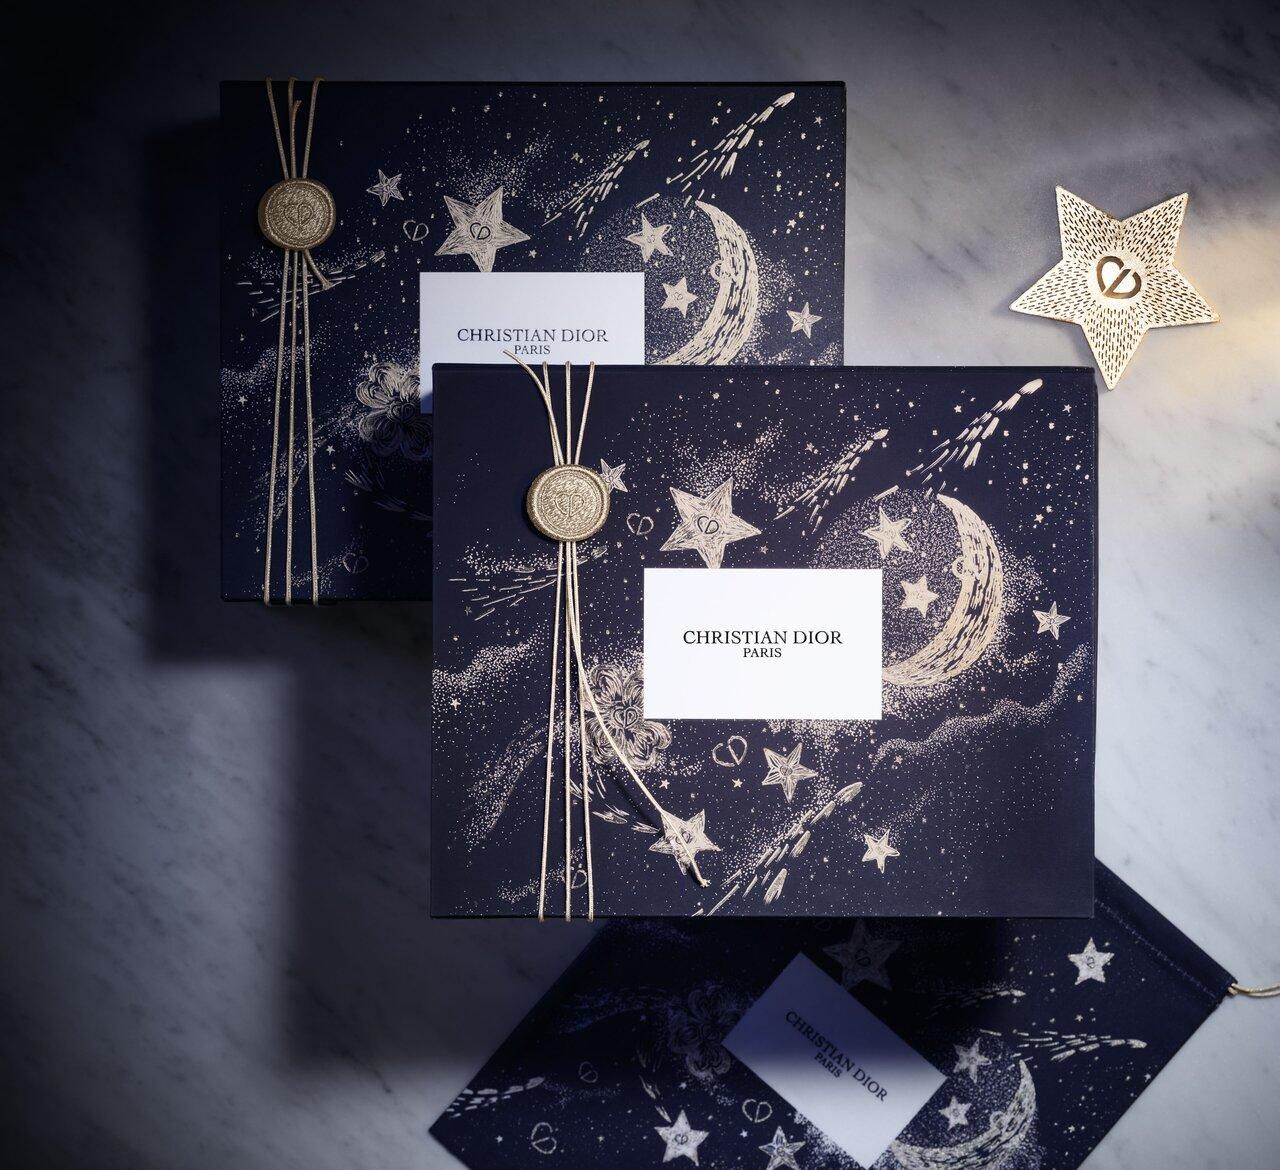 Dior(ディオール) ホリデーコレクション/クリスマスコフレ 2020 新作コスメ「メゾン クリスチャン ディオール アドヴェント カレンダー」